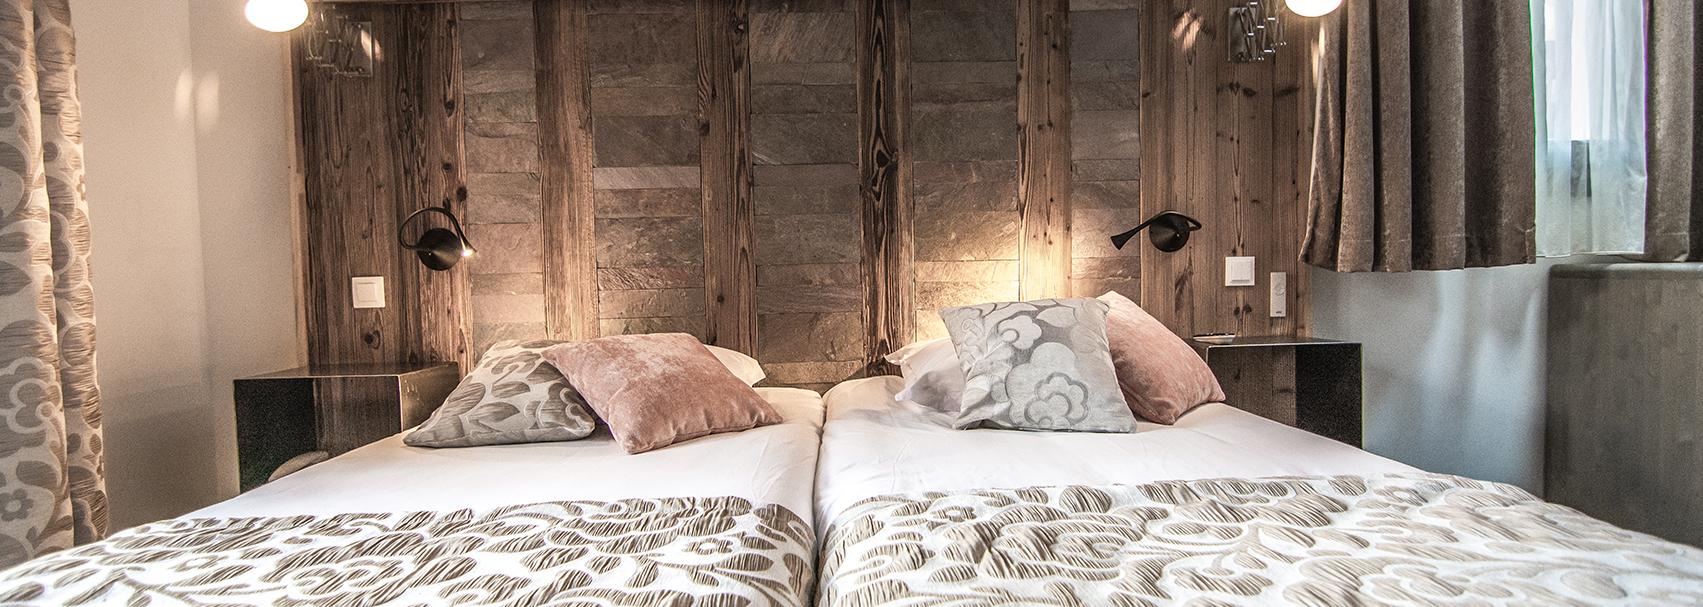 h tel altis brides les bains ski 3 vallees suite cocoon. Black Bedroom Furniture Sets. Home Design Ideas